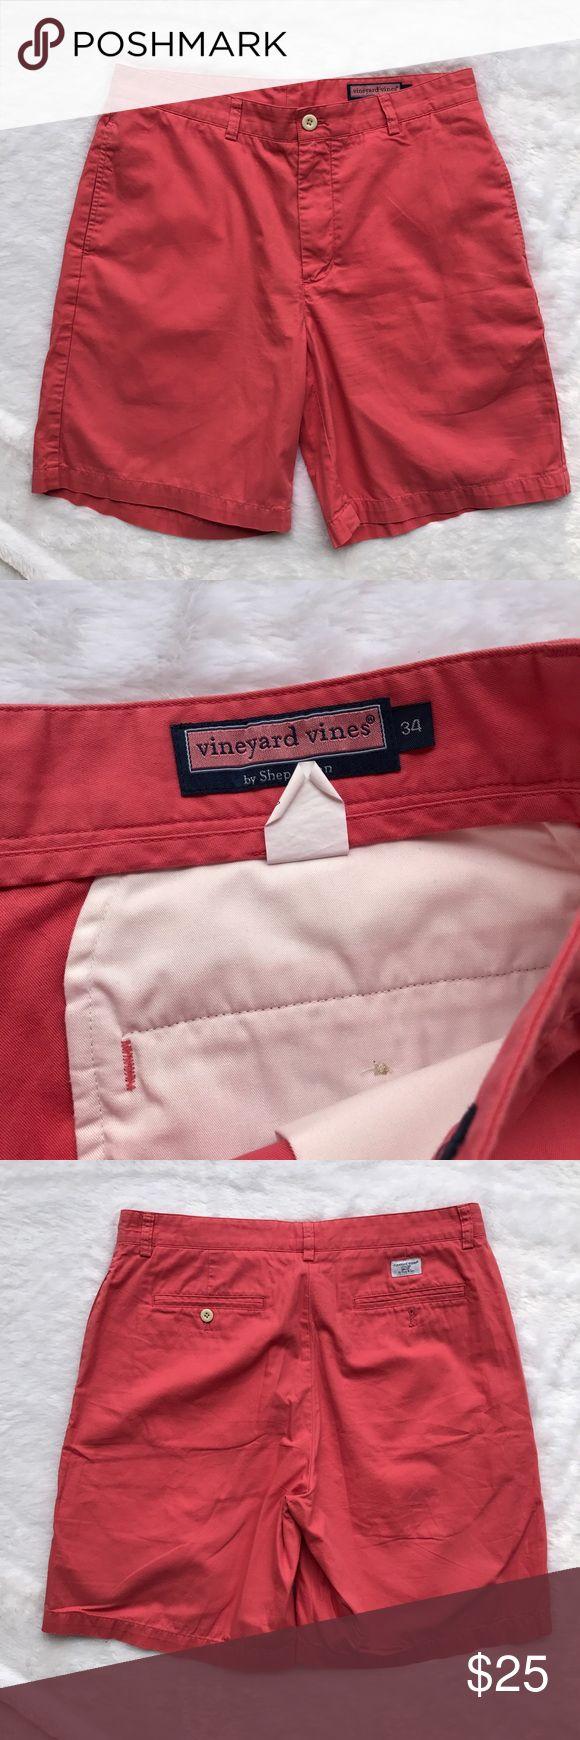 Vineyard Vines Men's Coral Red Shorts Condition: Great Size: 34 Color: Coral Vineyard Vines Shorts Cargo